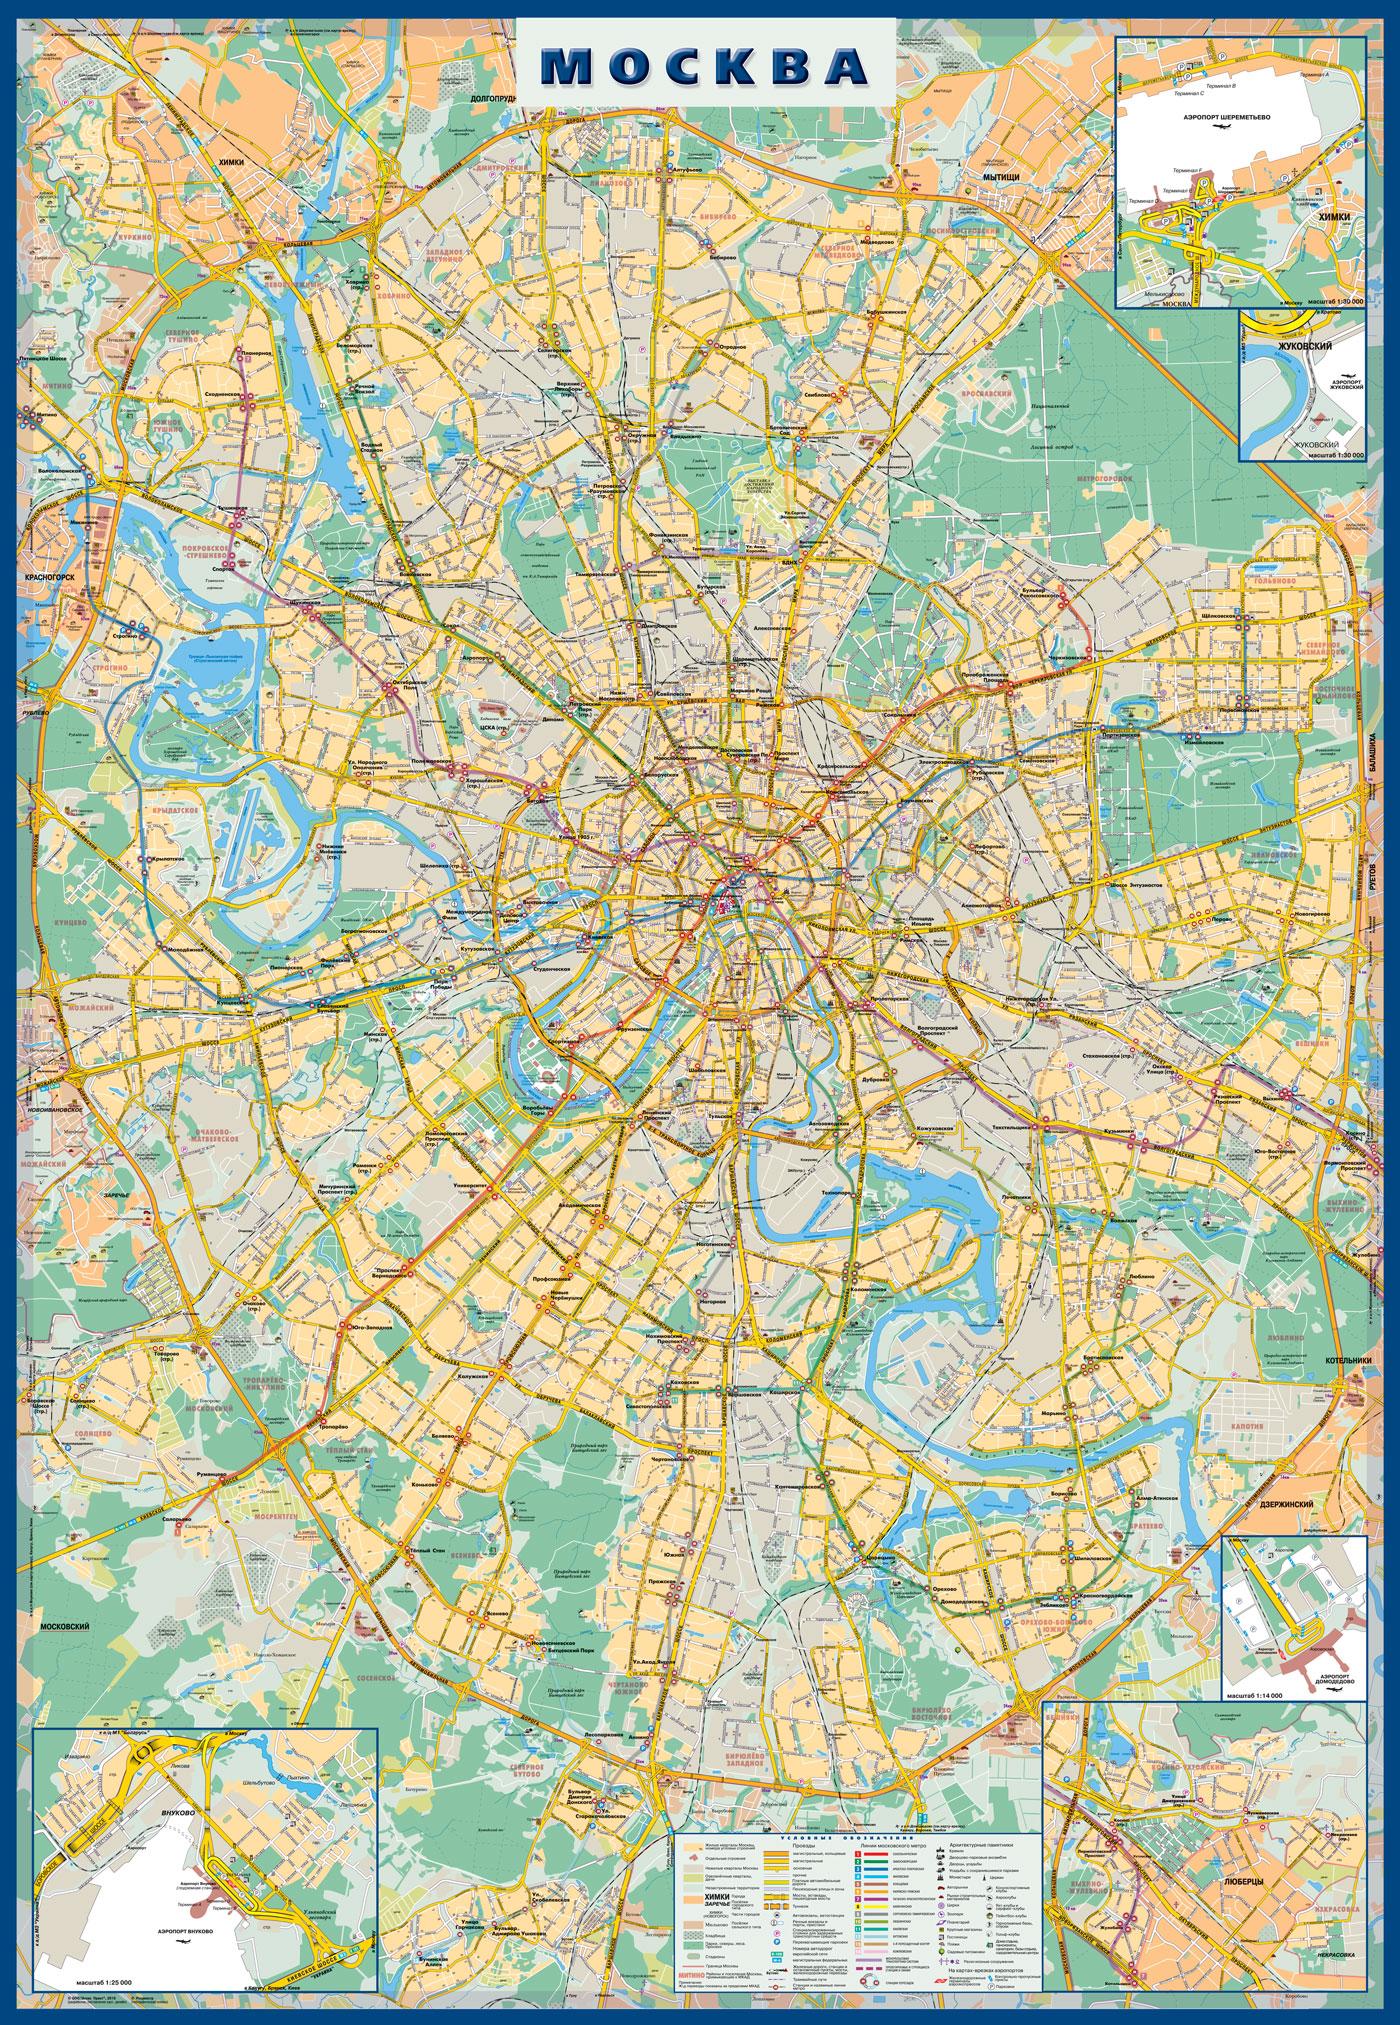 Настенная карта Москвы с линиями метрополитена размер 1,40х2,03 м